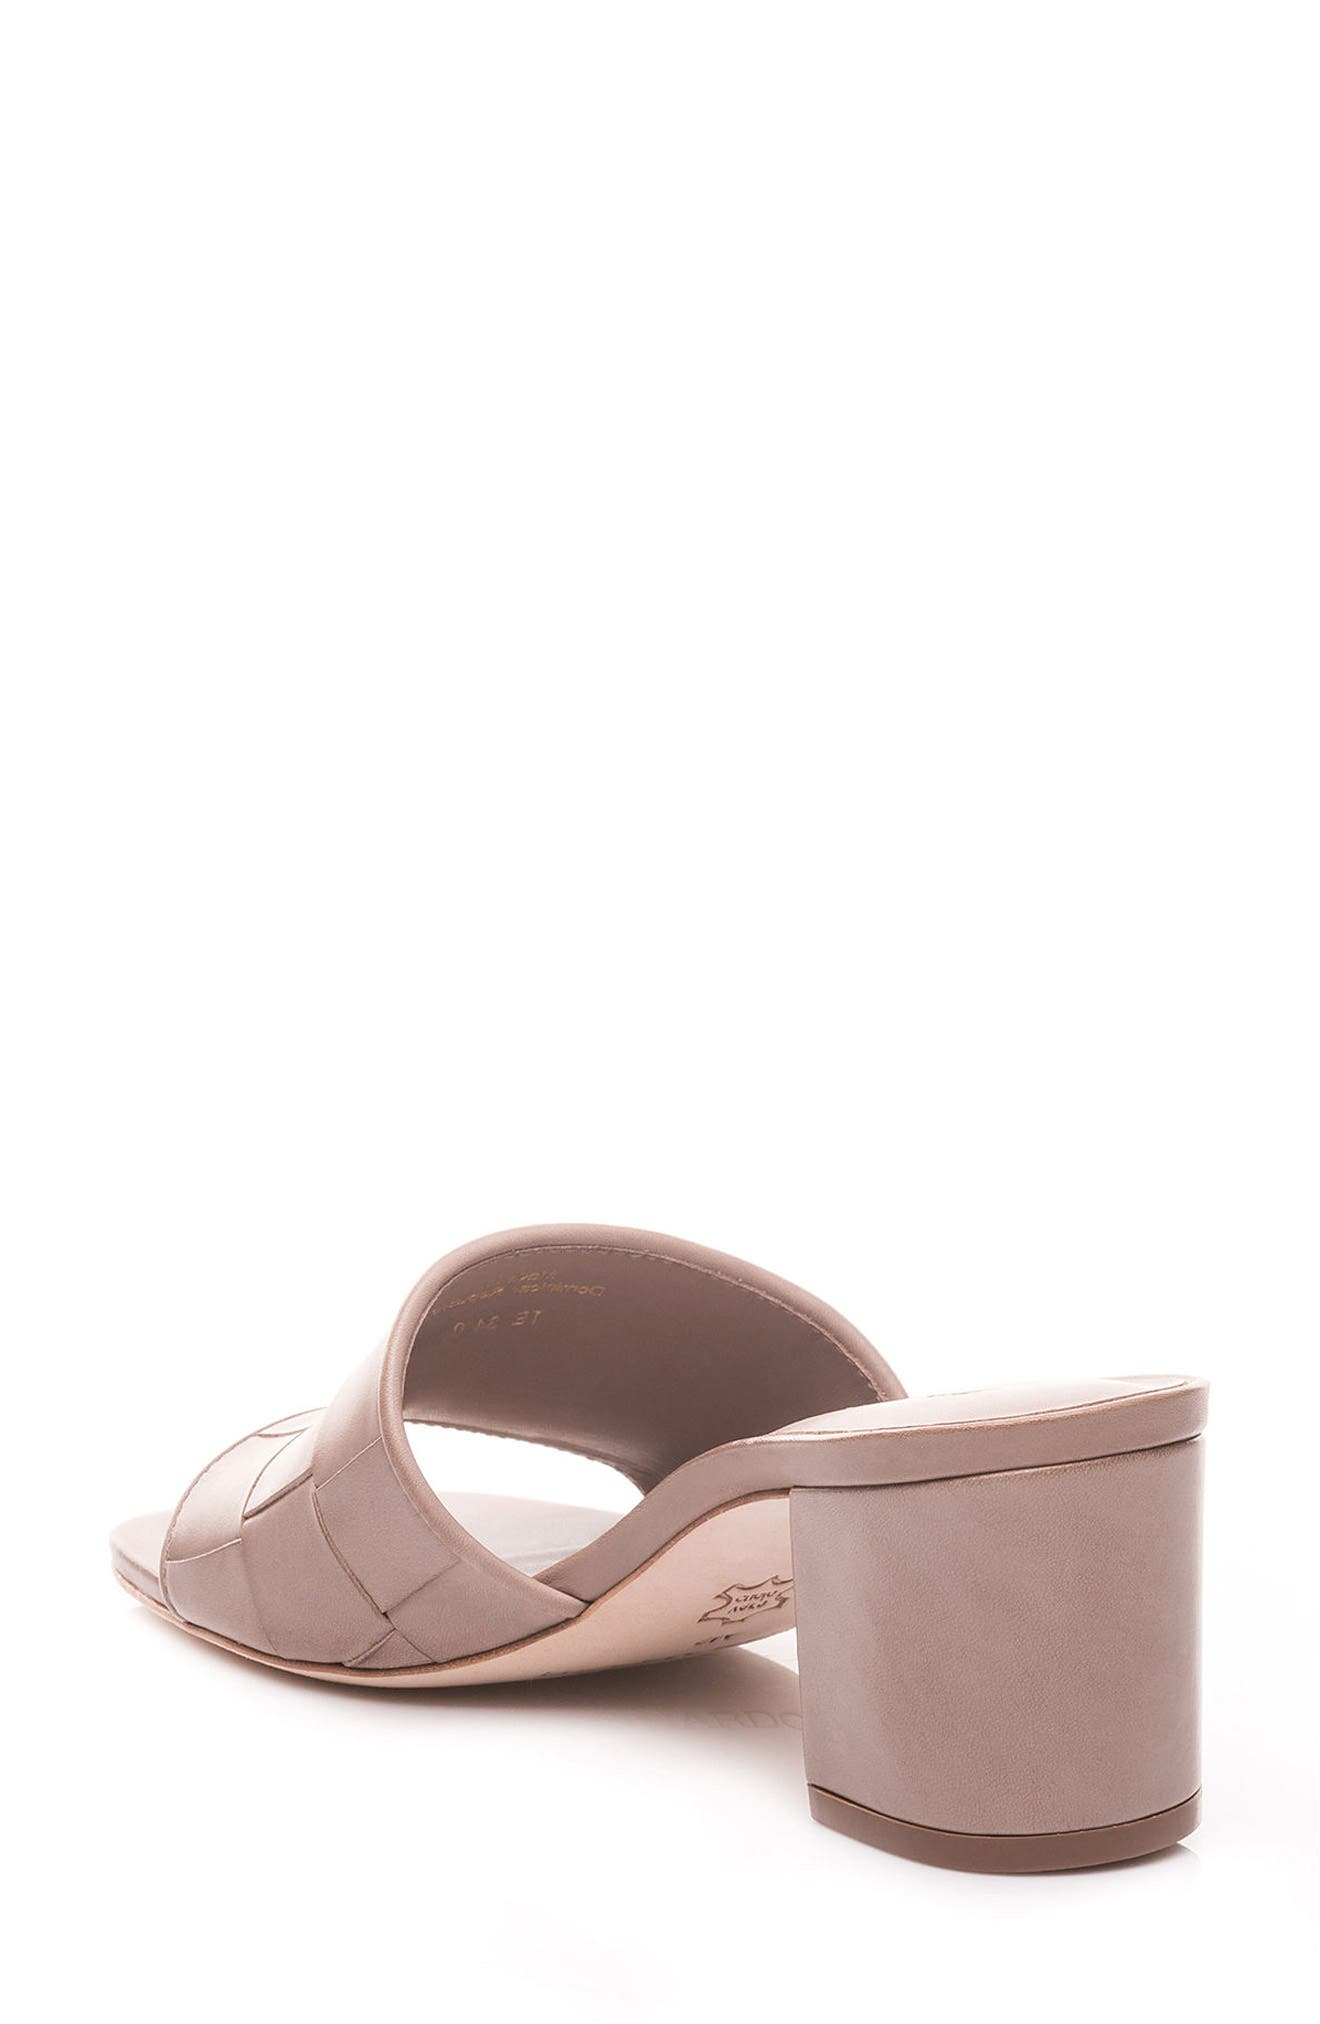 Bernardo Bridget Block Heel Sandal,                             Alternate thumbnail 6, color,